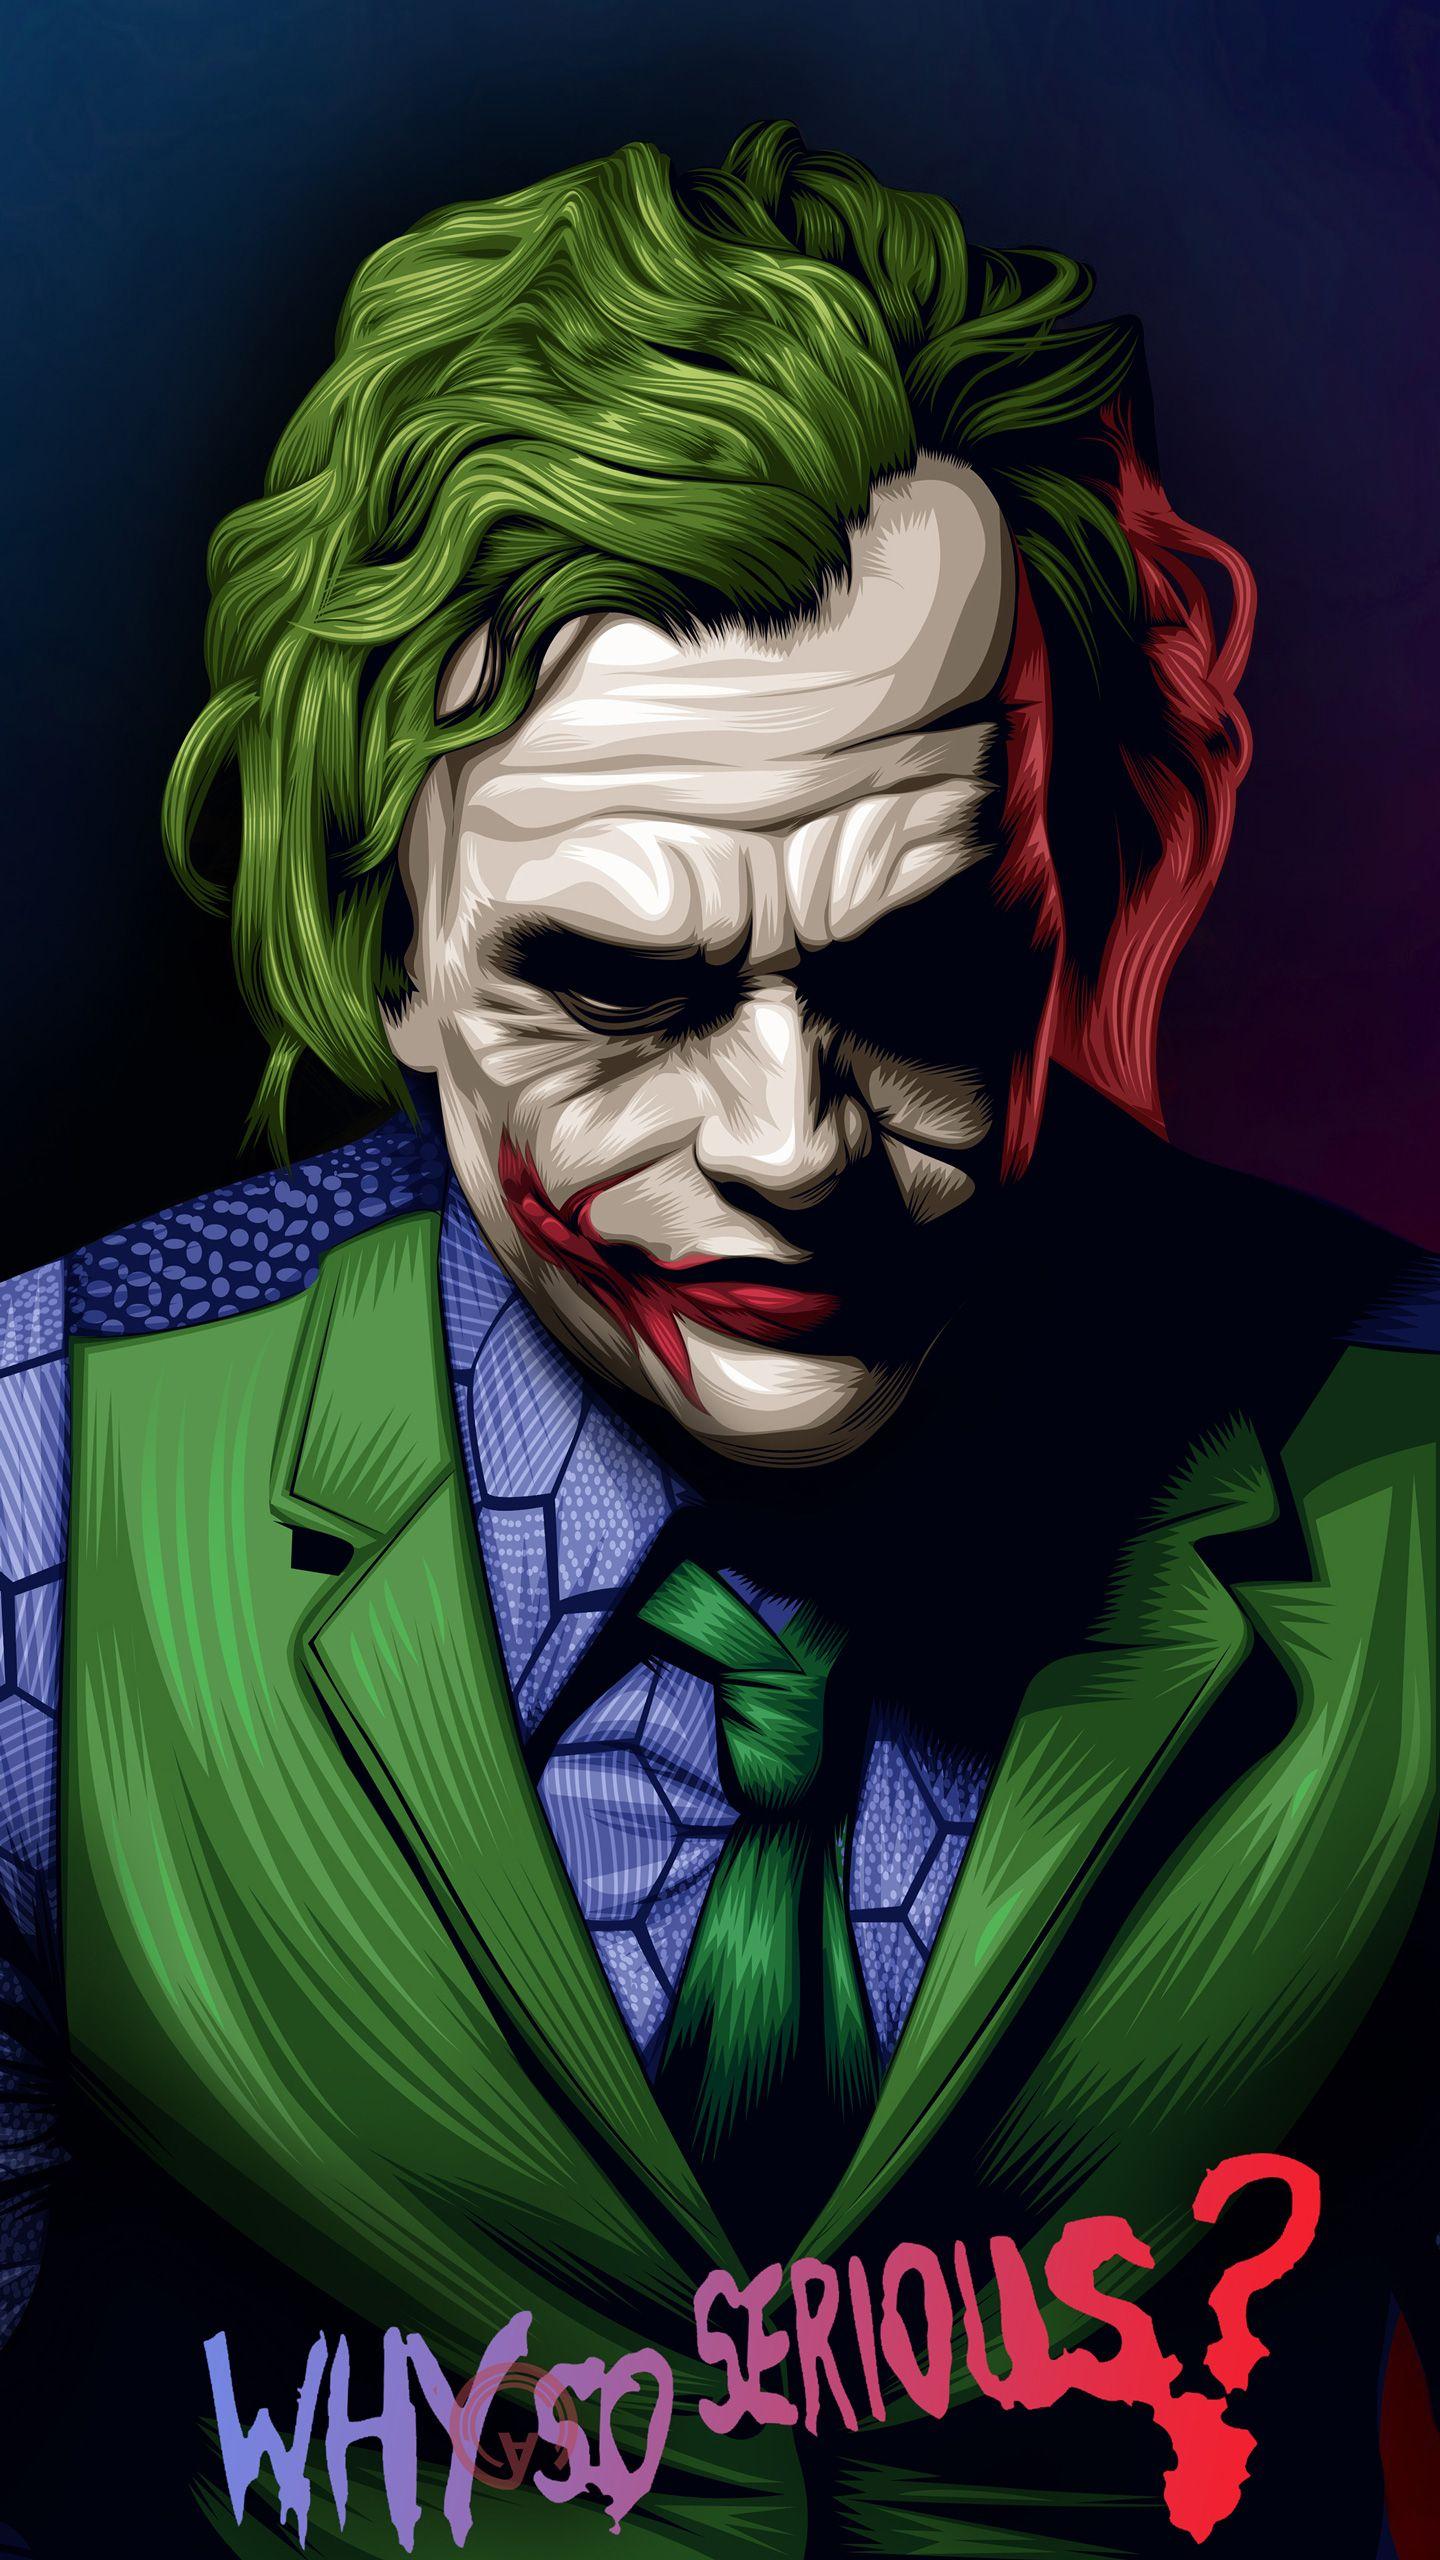 Joker Wallpapers Joker Hd Wallpaper Joker Wallpapers Joker Drawings Batman joker mobile iphone images joker